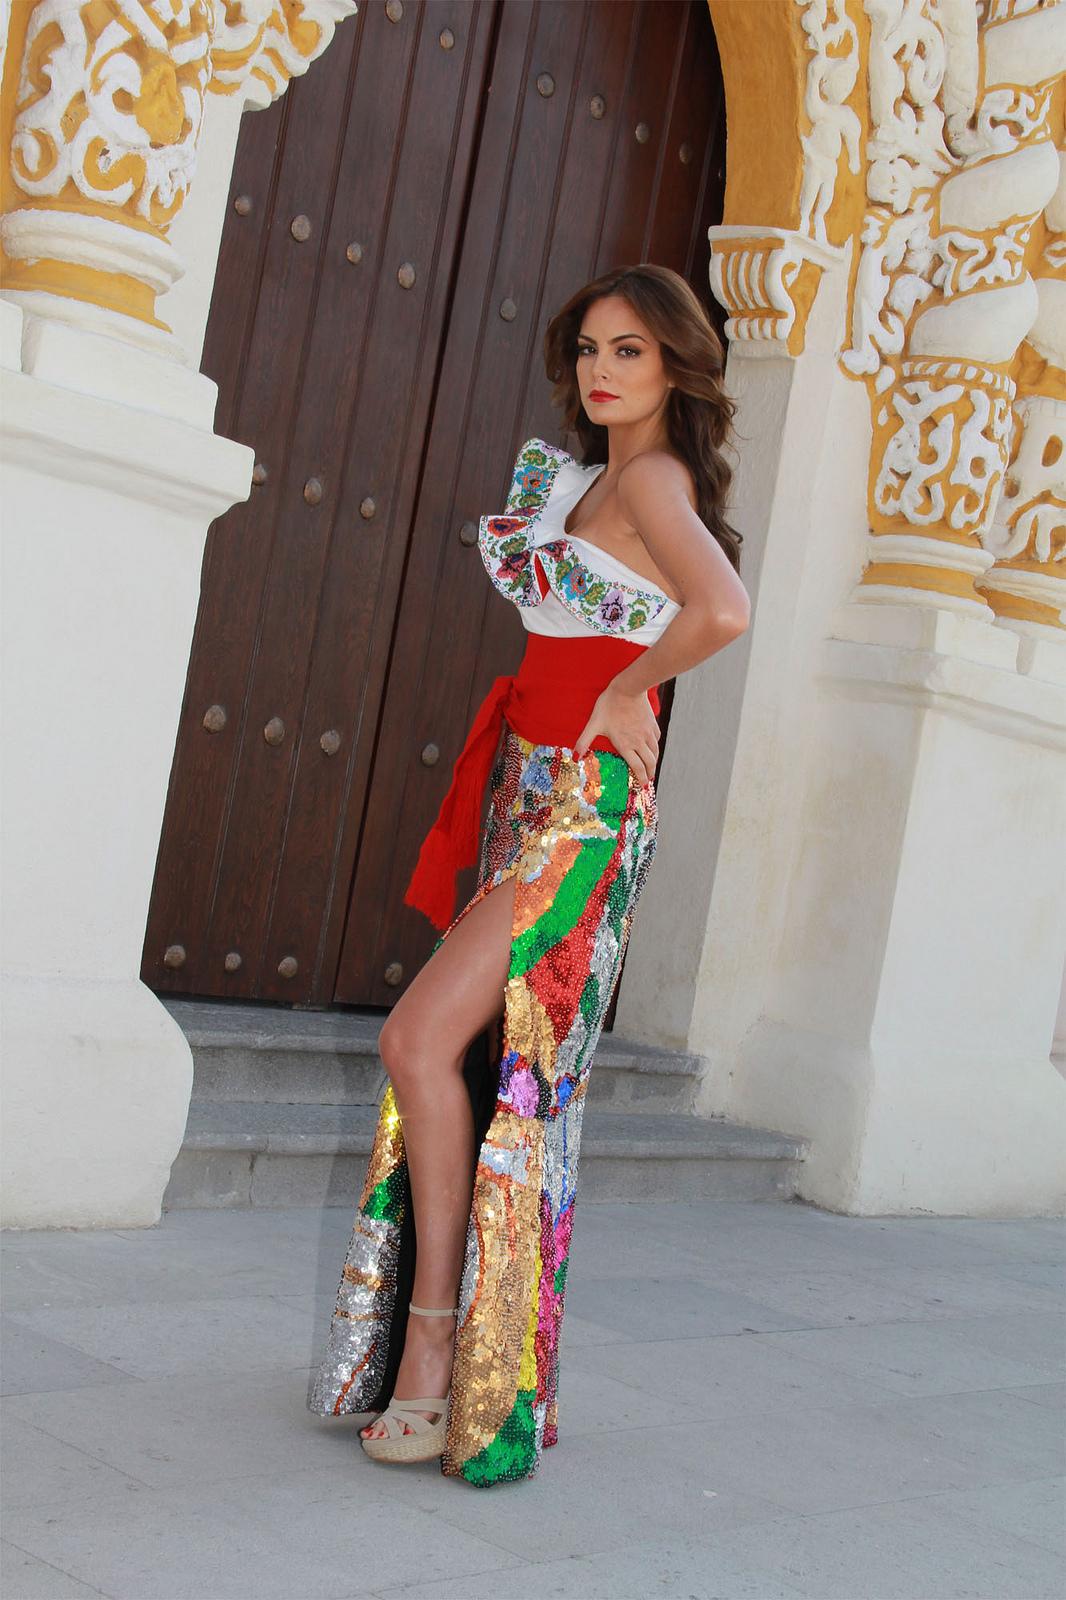 Ximena Navarrete/ /ხიმენა ნავარეტე #1 E435cd87ccd482d56c22cd60dbe13c08